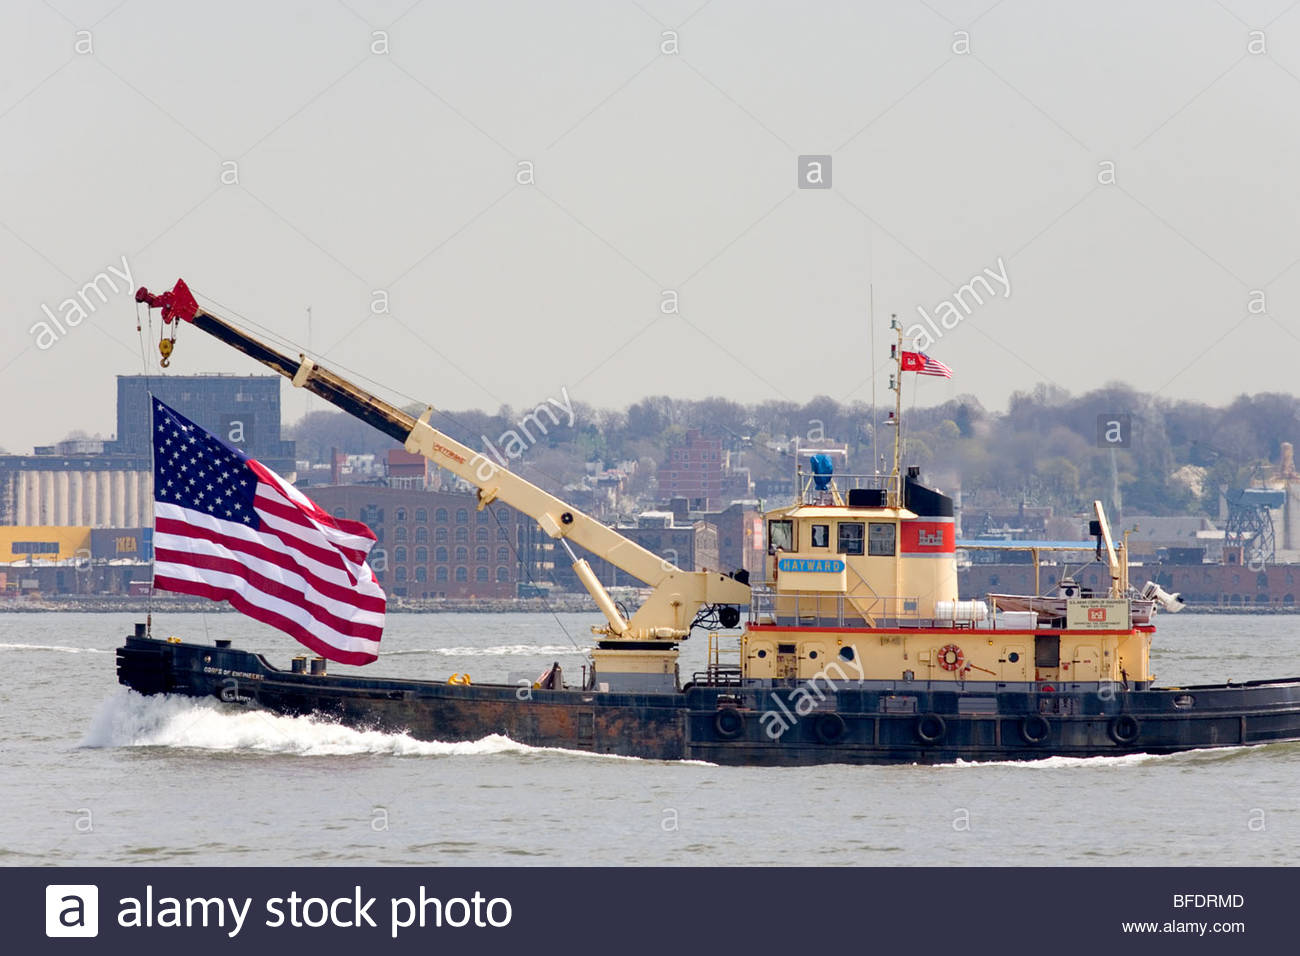 United States Coast Guard Ship in Hudson Bay, New York. - Stock Image